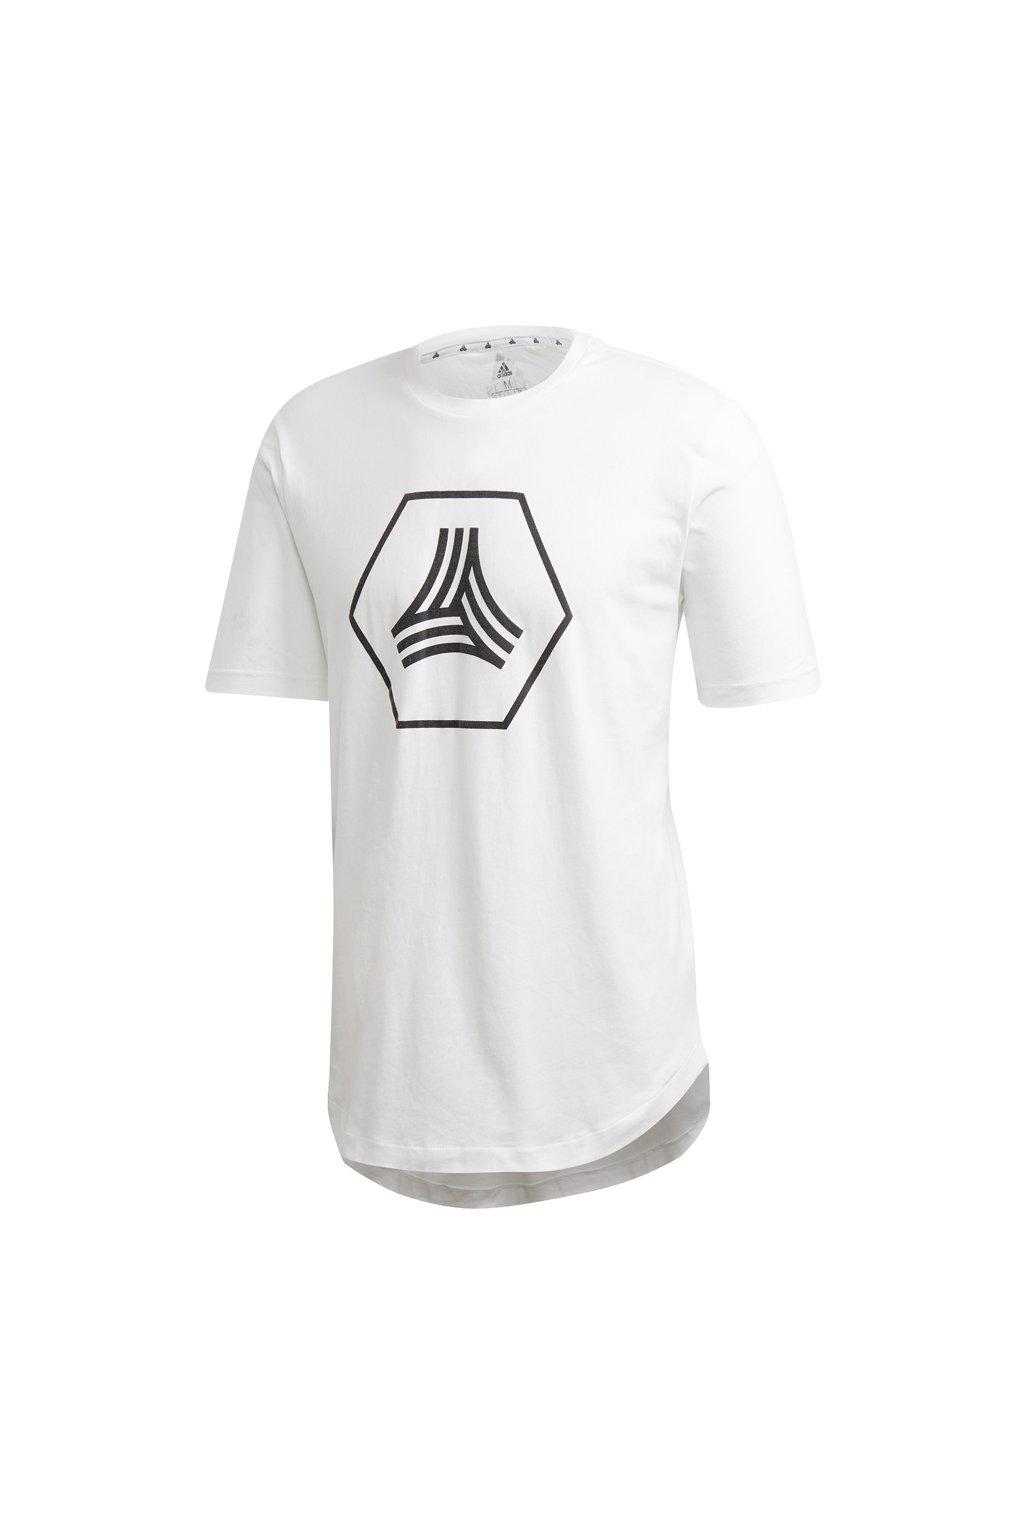 Pánske tričko adidas Tan Logo Tee biele FJ6340